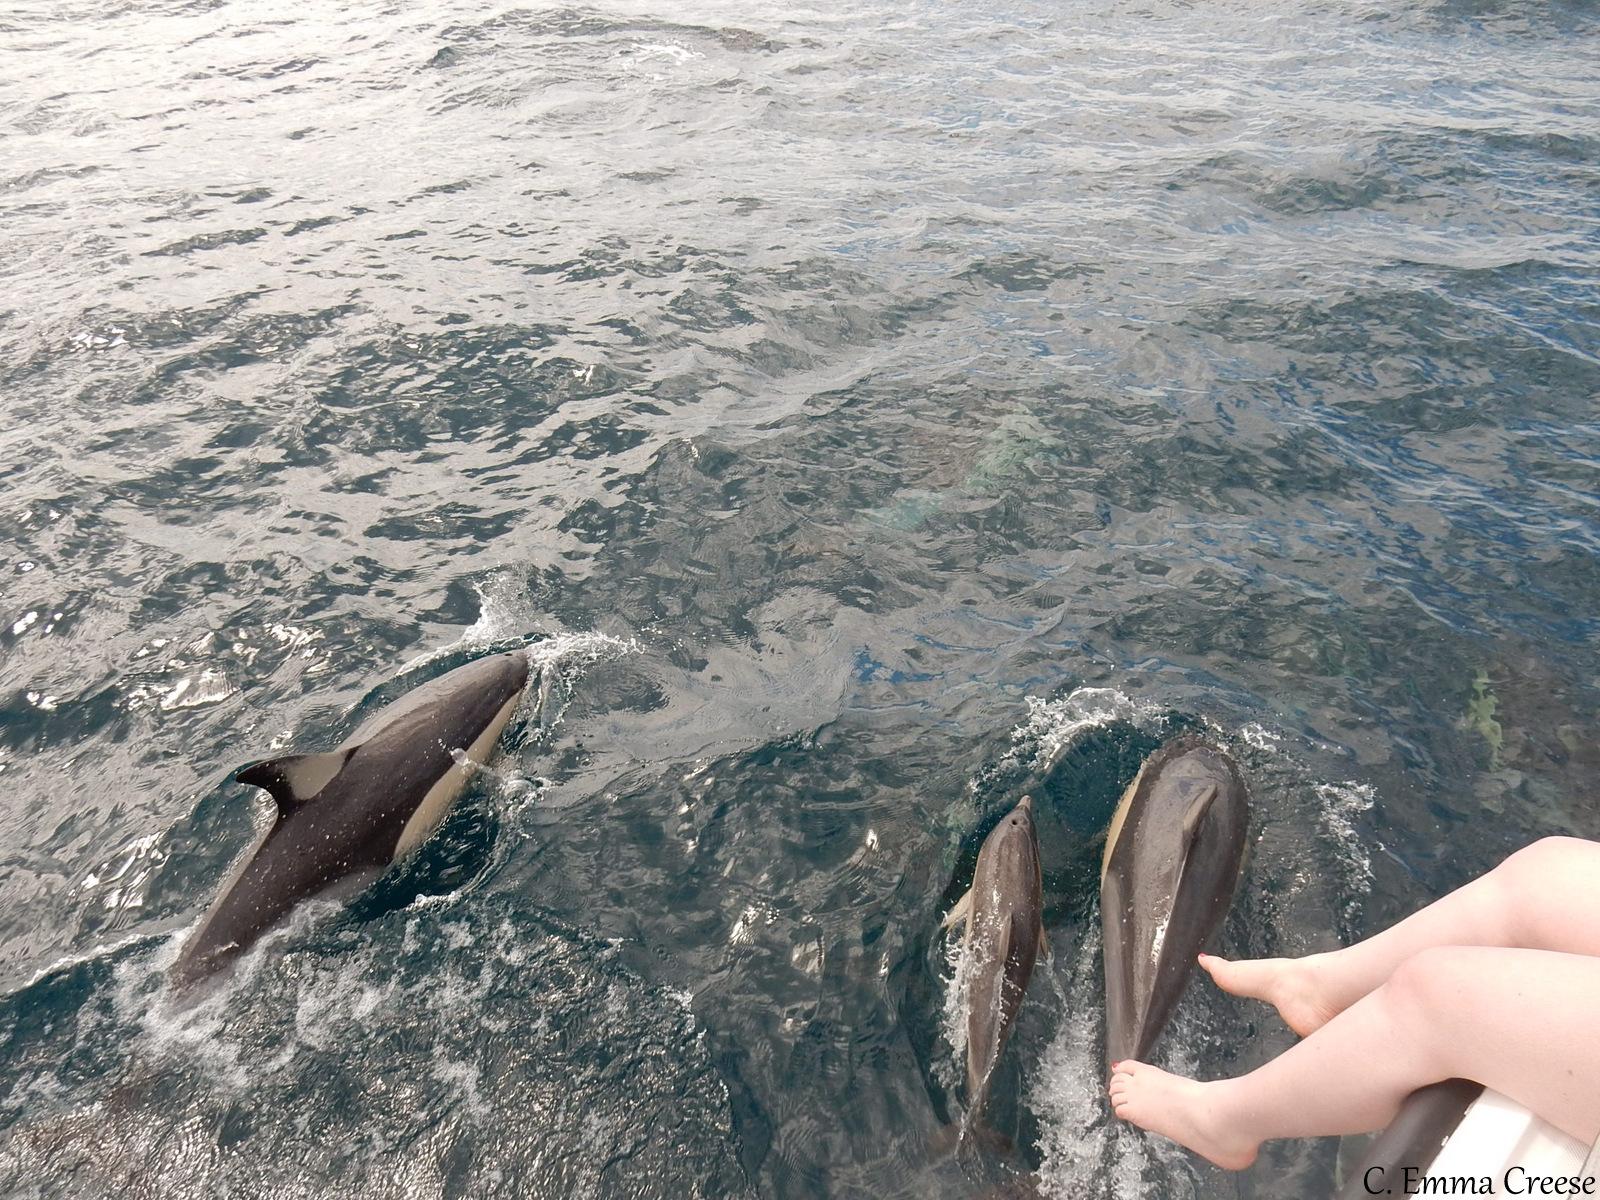 Wild dolphins in Tauranga New Zealand – Love Travel Linkup